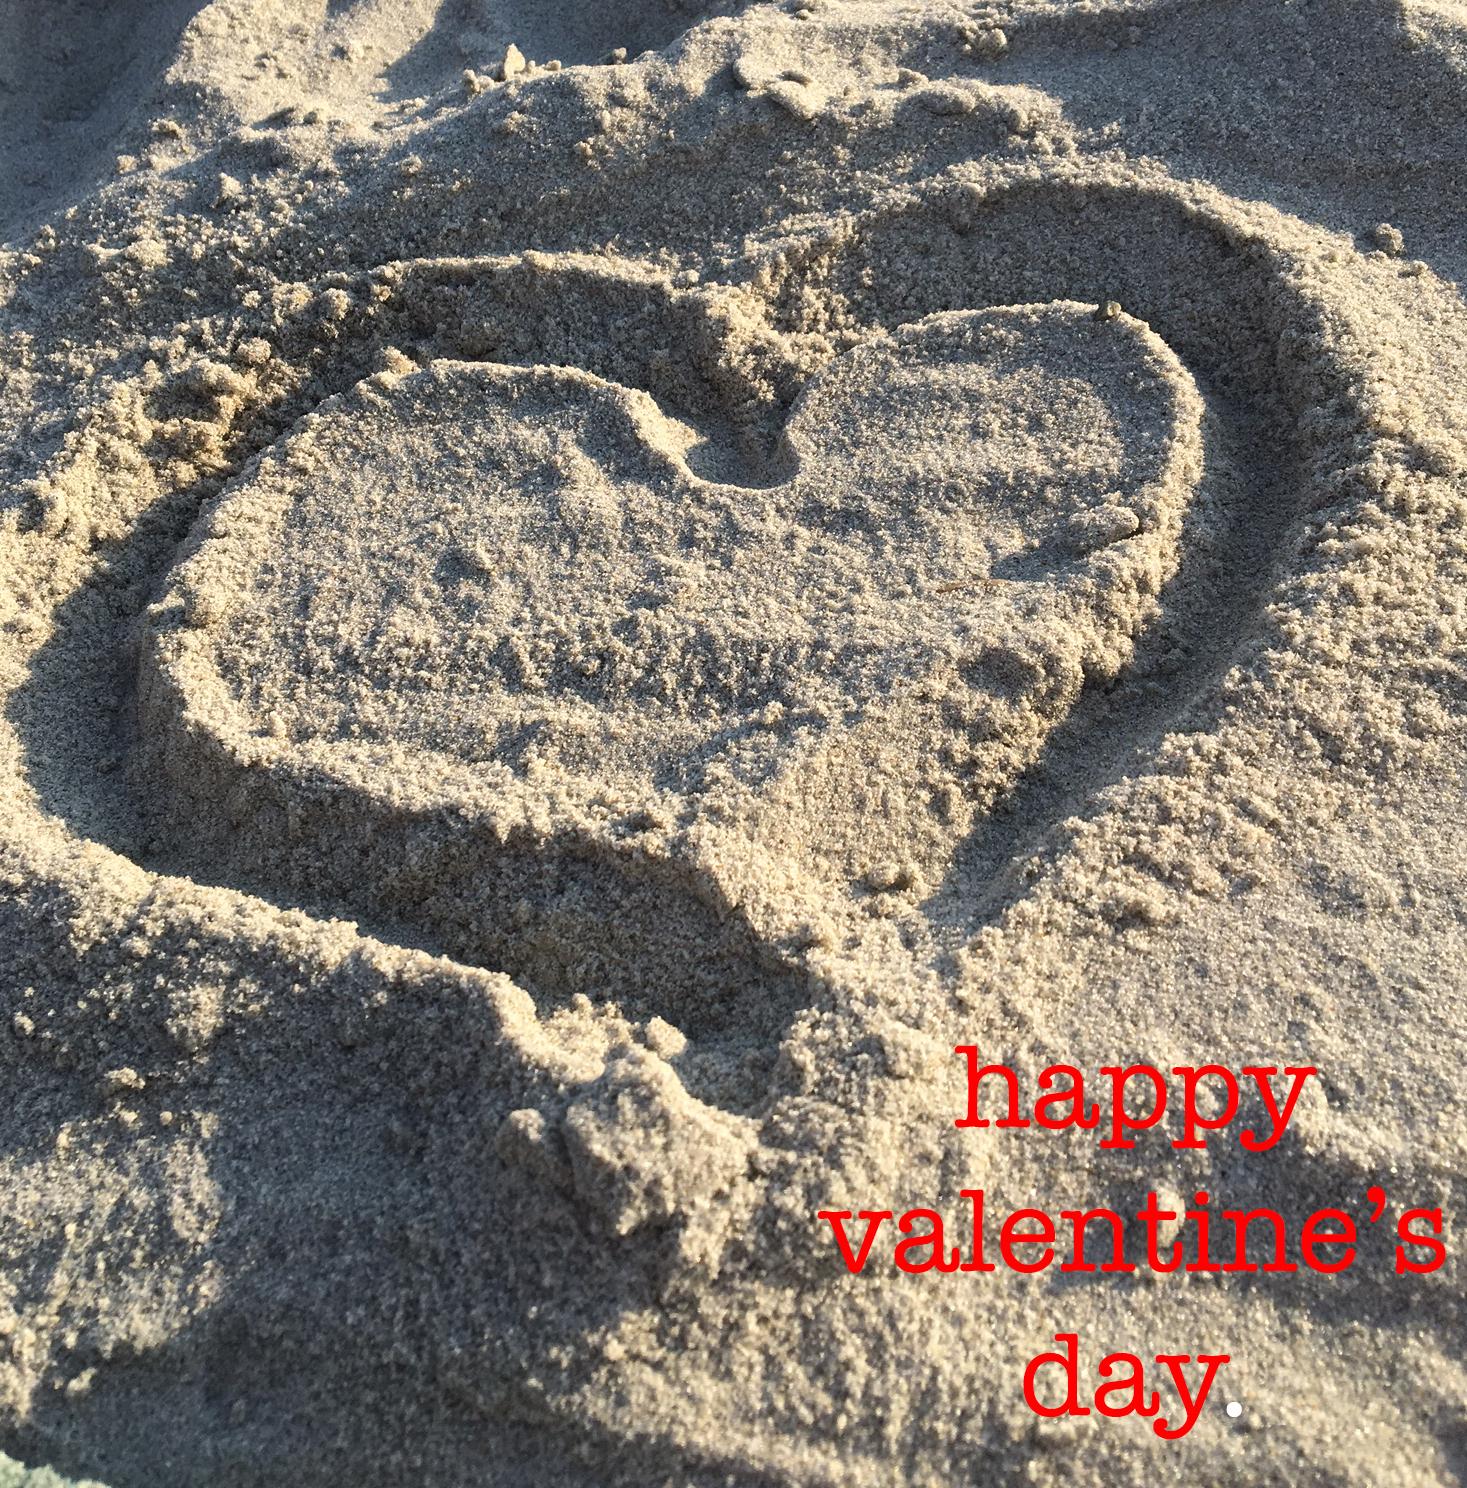 heart in sand happy valentine's day